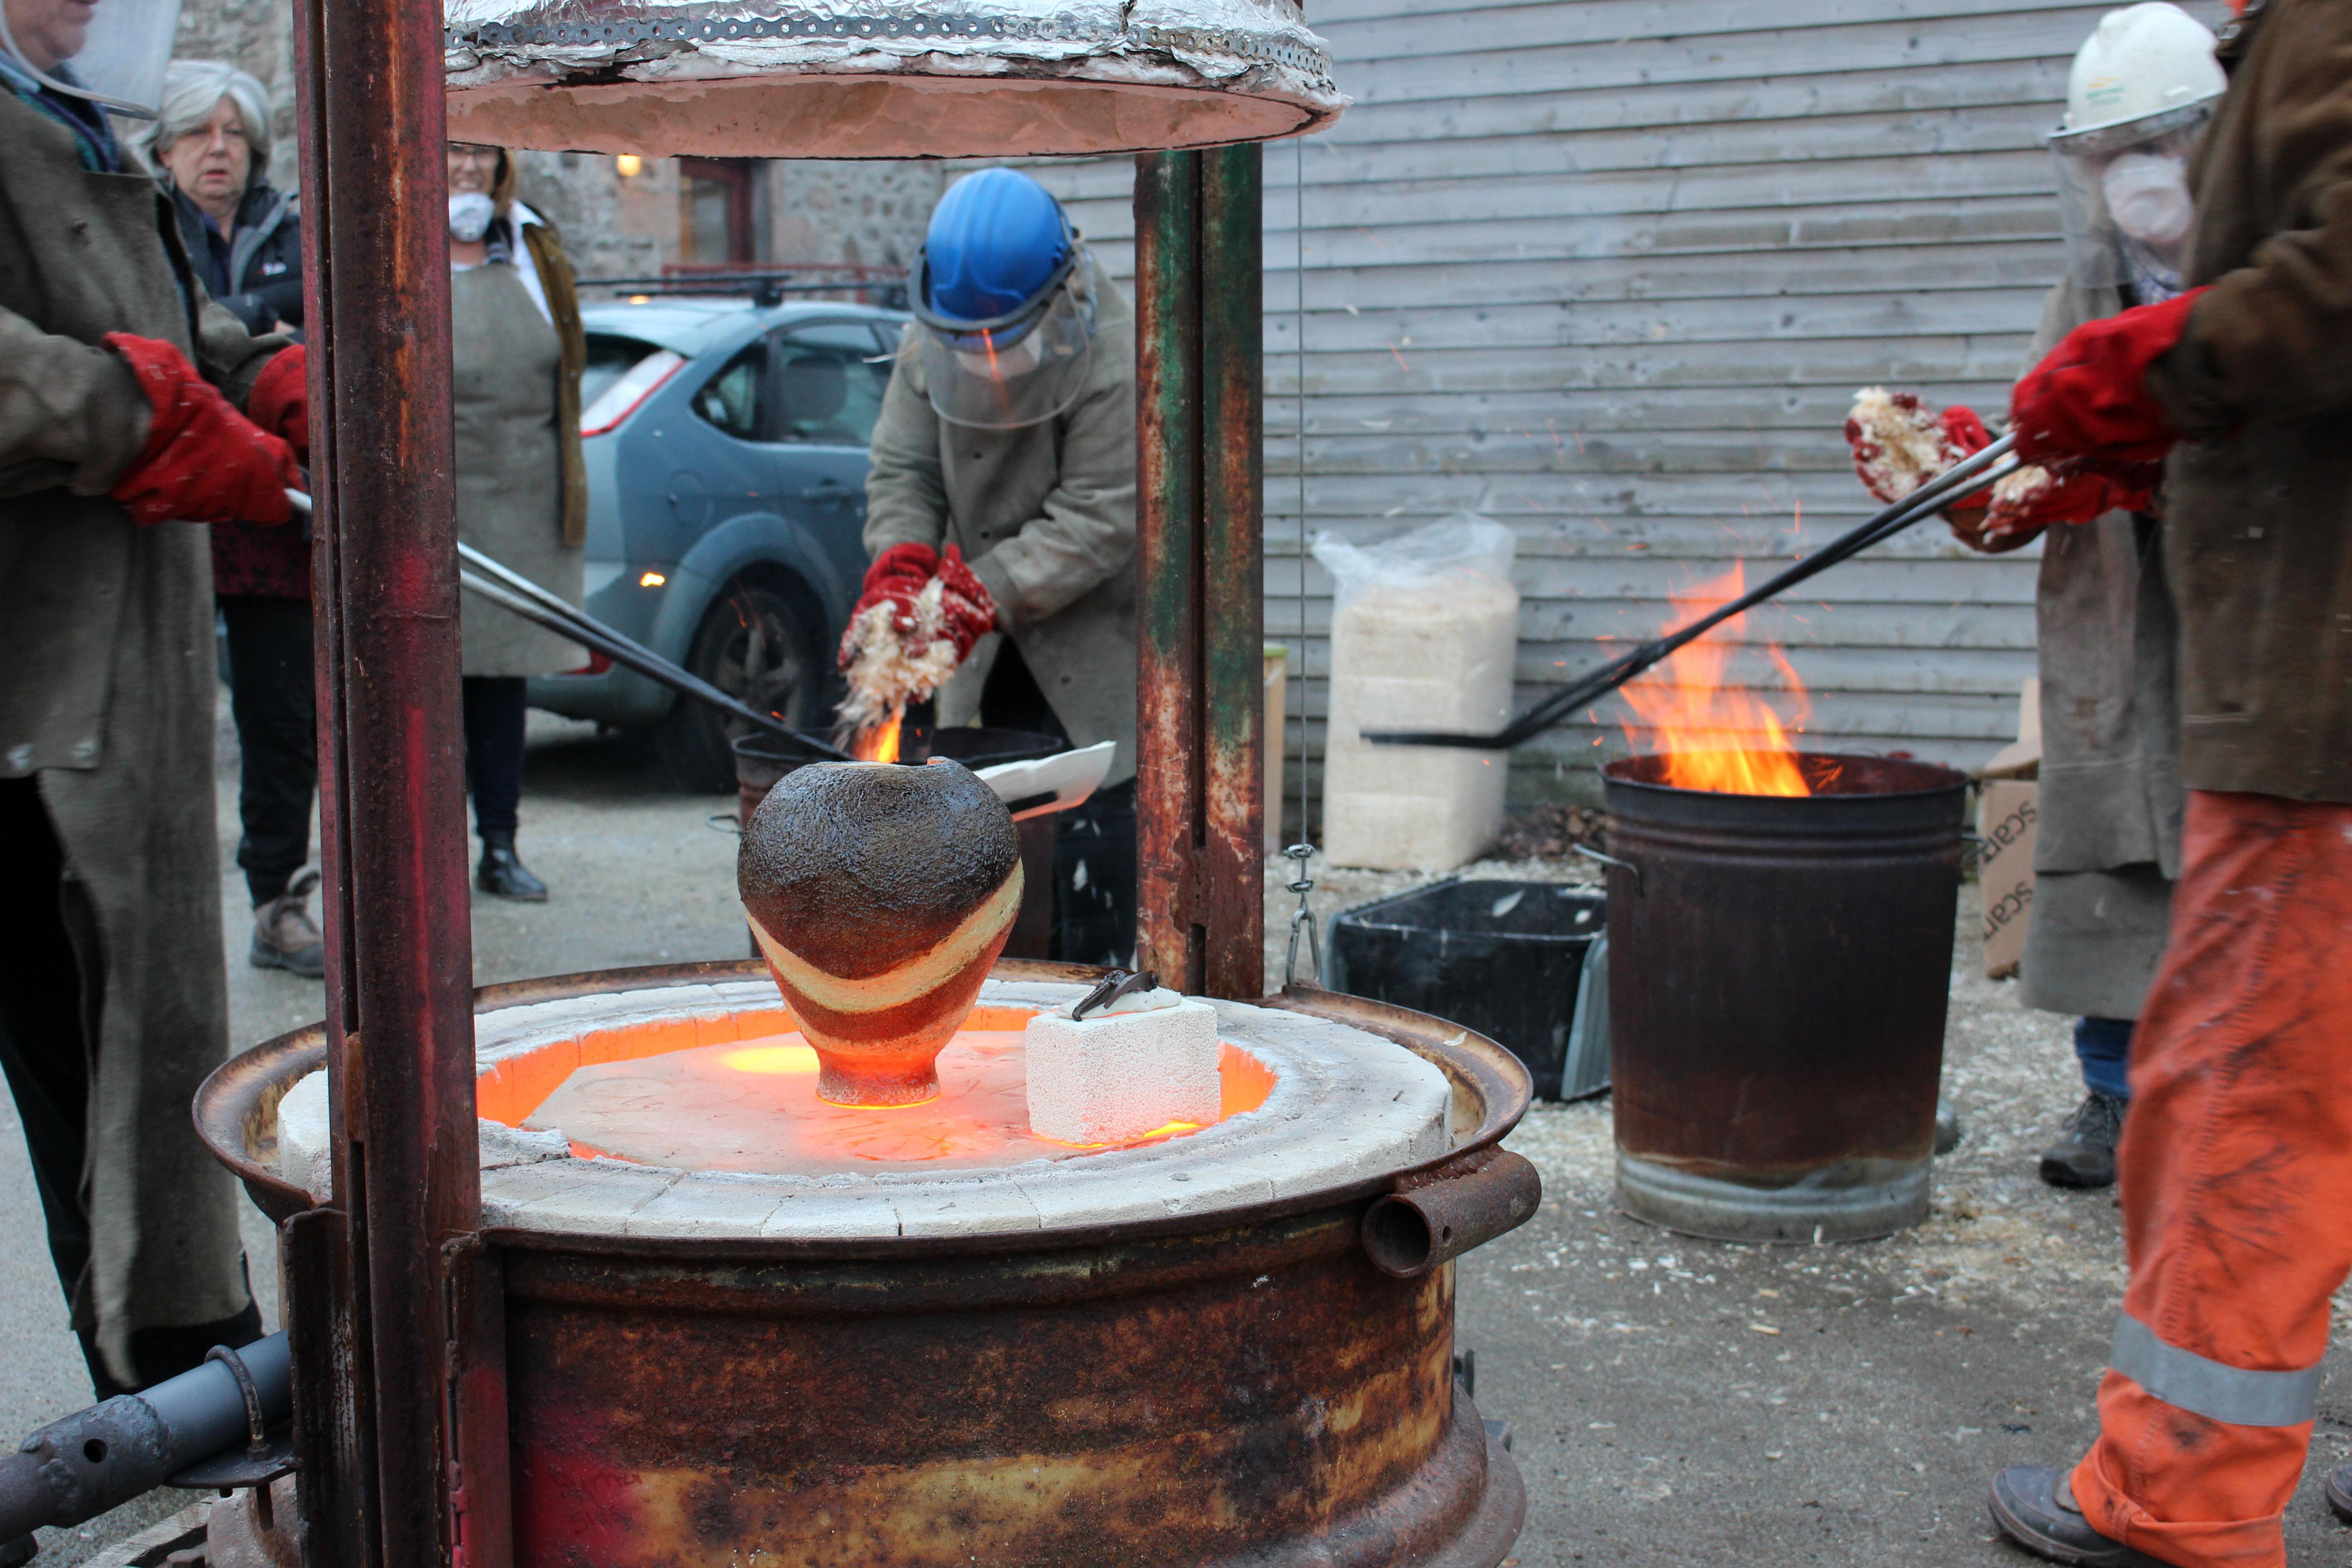 A large vase coming out of the raku kiln